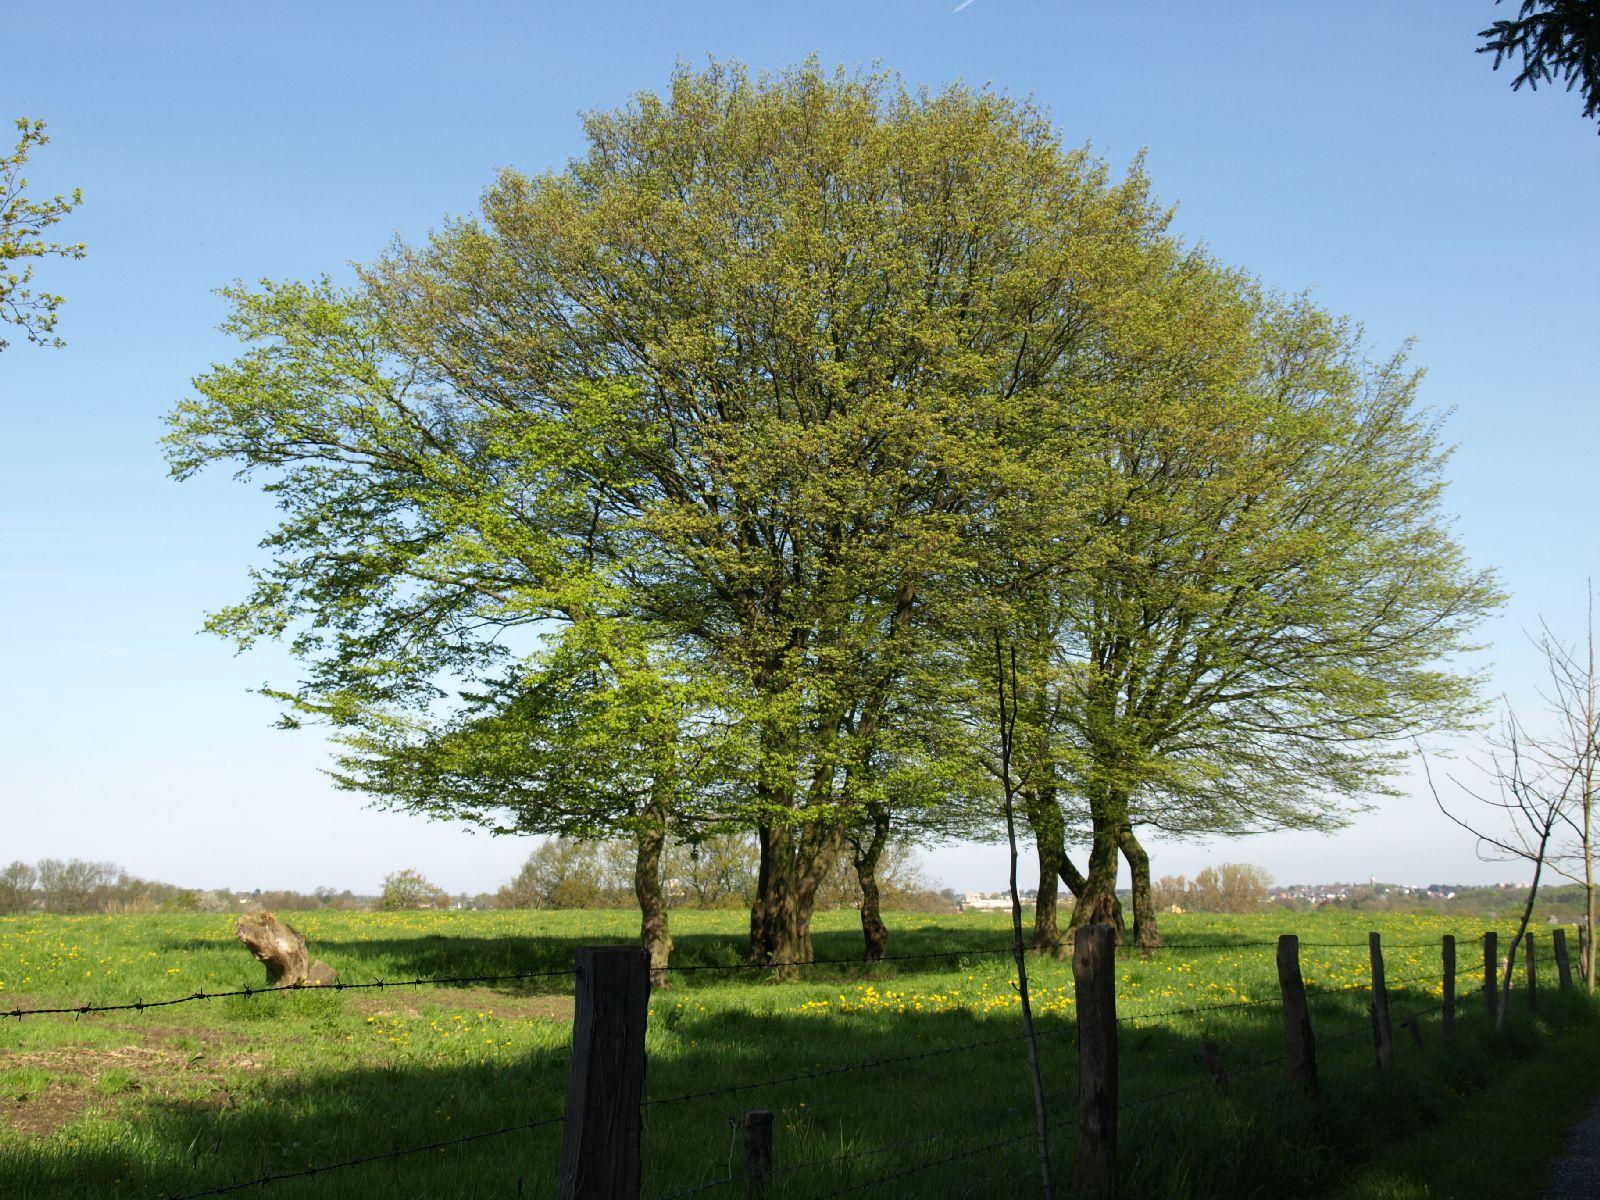 Plants-Trees_Photo_Texture_B_P5032296